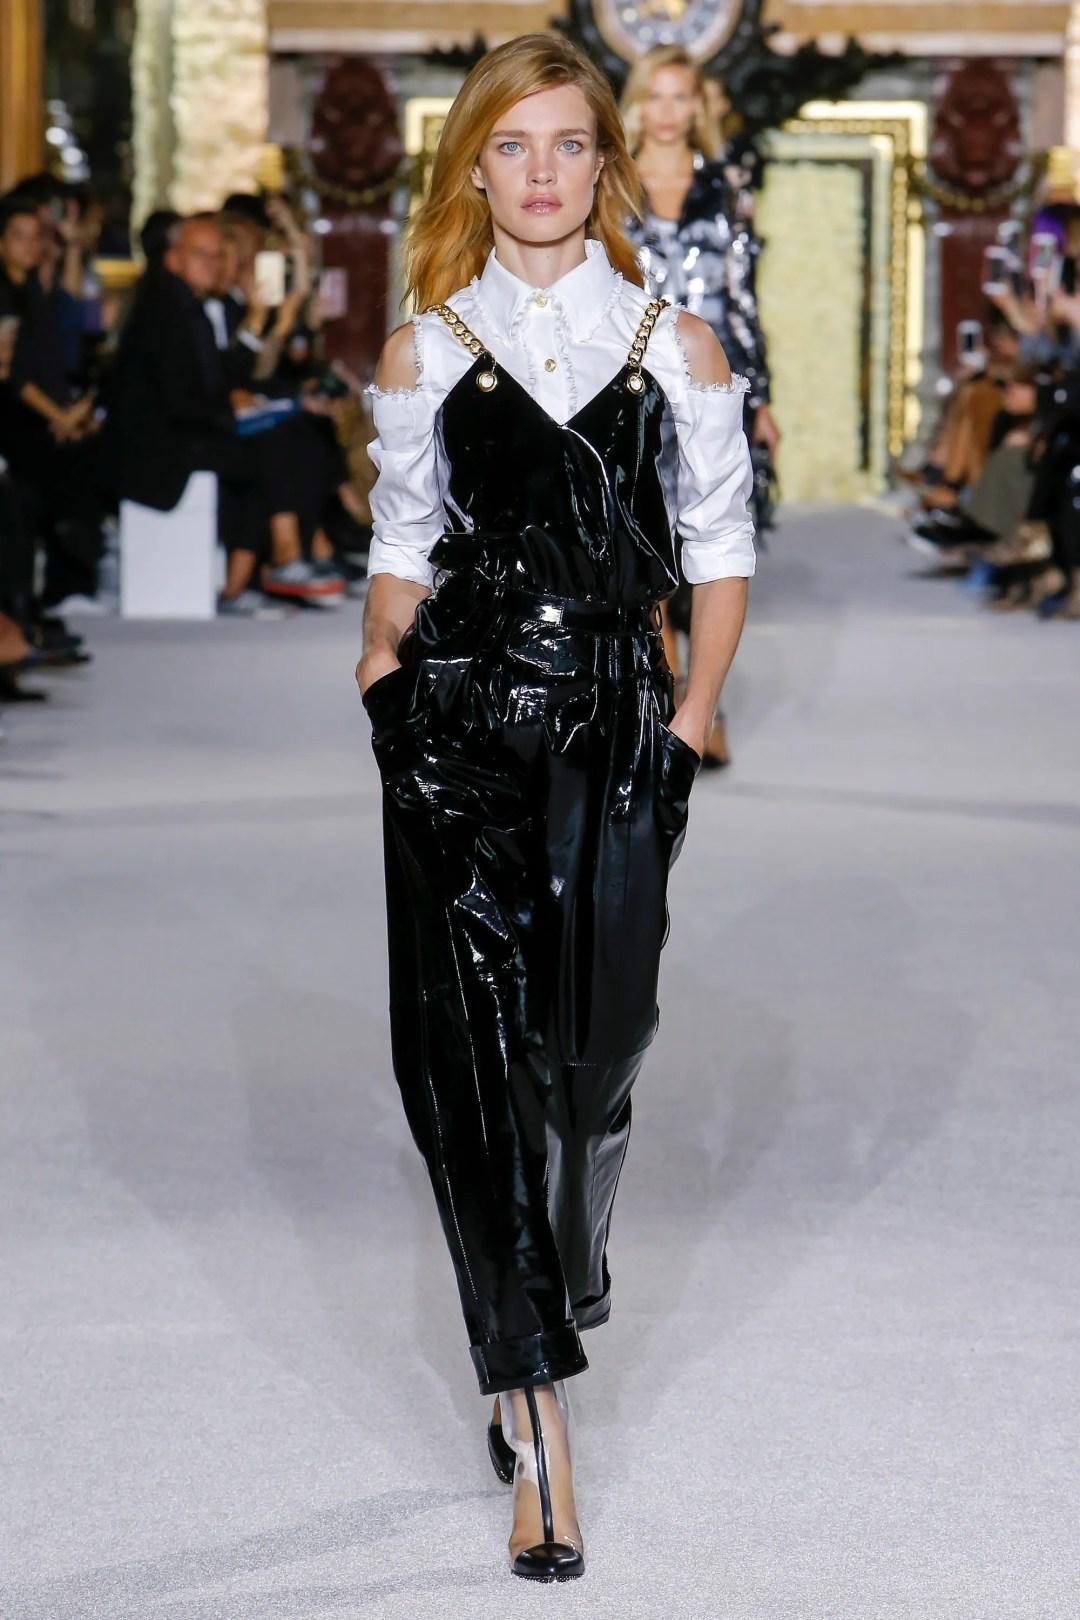 FULL COLLECTION: BALMAIN SPRING 2018 READY-TO-WEAR Haute Couture | #Runway #Fashion #Style #Couture #FashionWeek #RenttheR unway #ad #RTW @Balmain | via @FashionWeekPro ? FashionWeek.pro